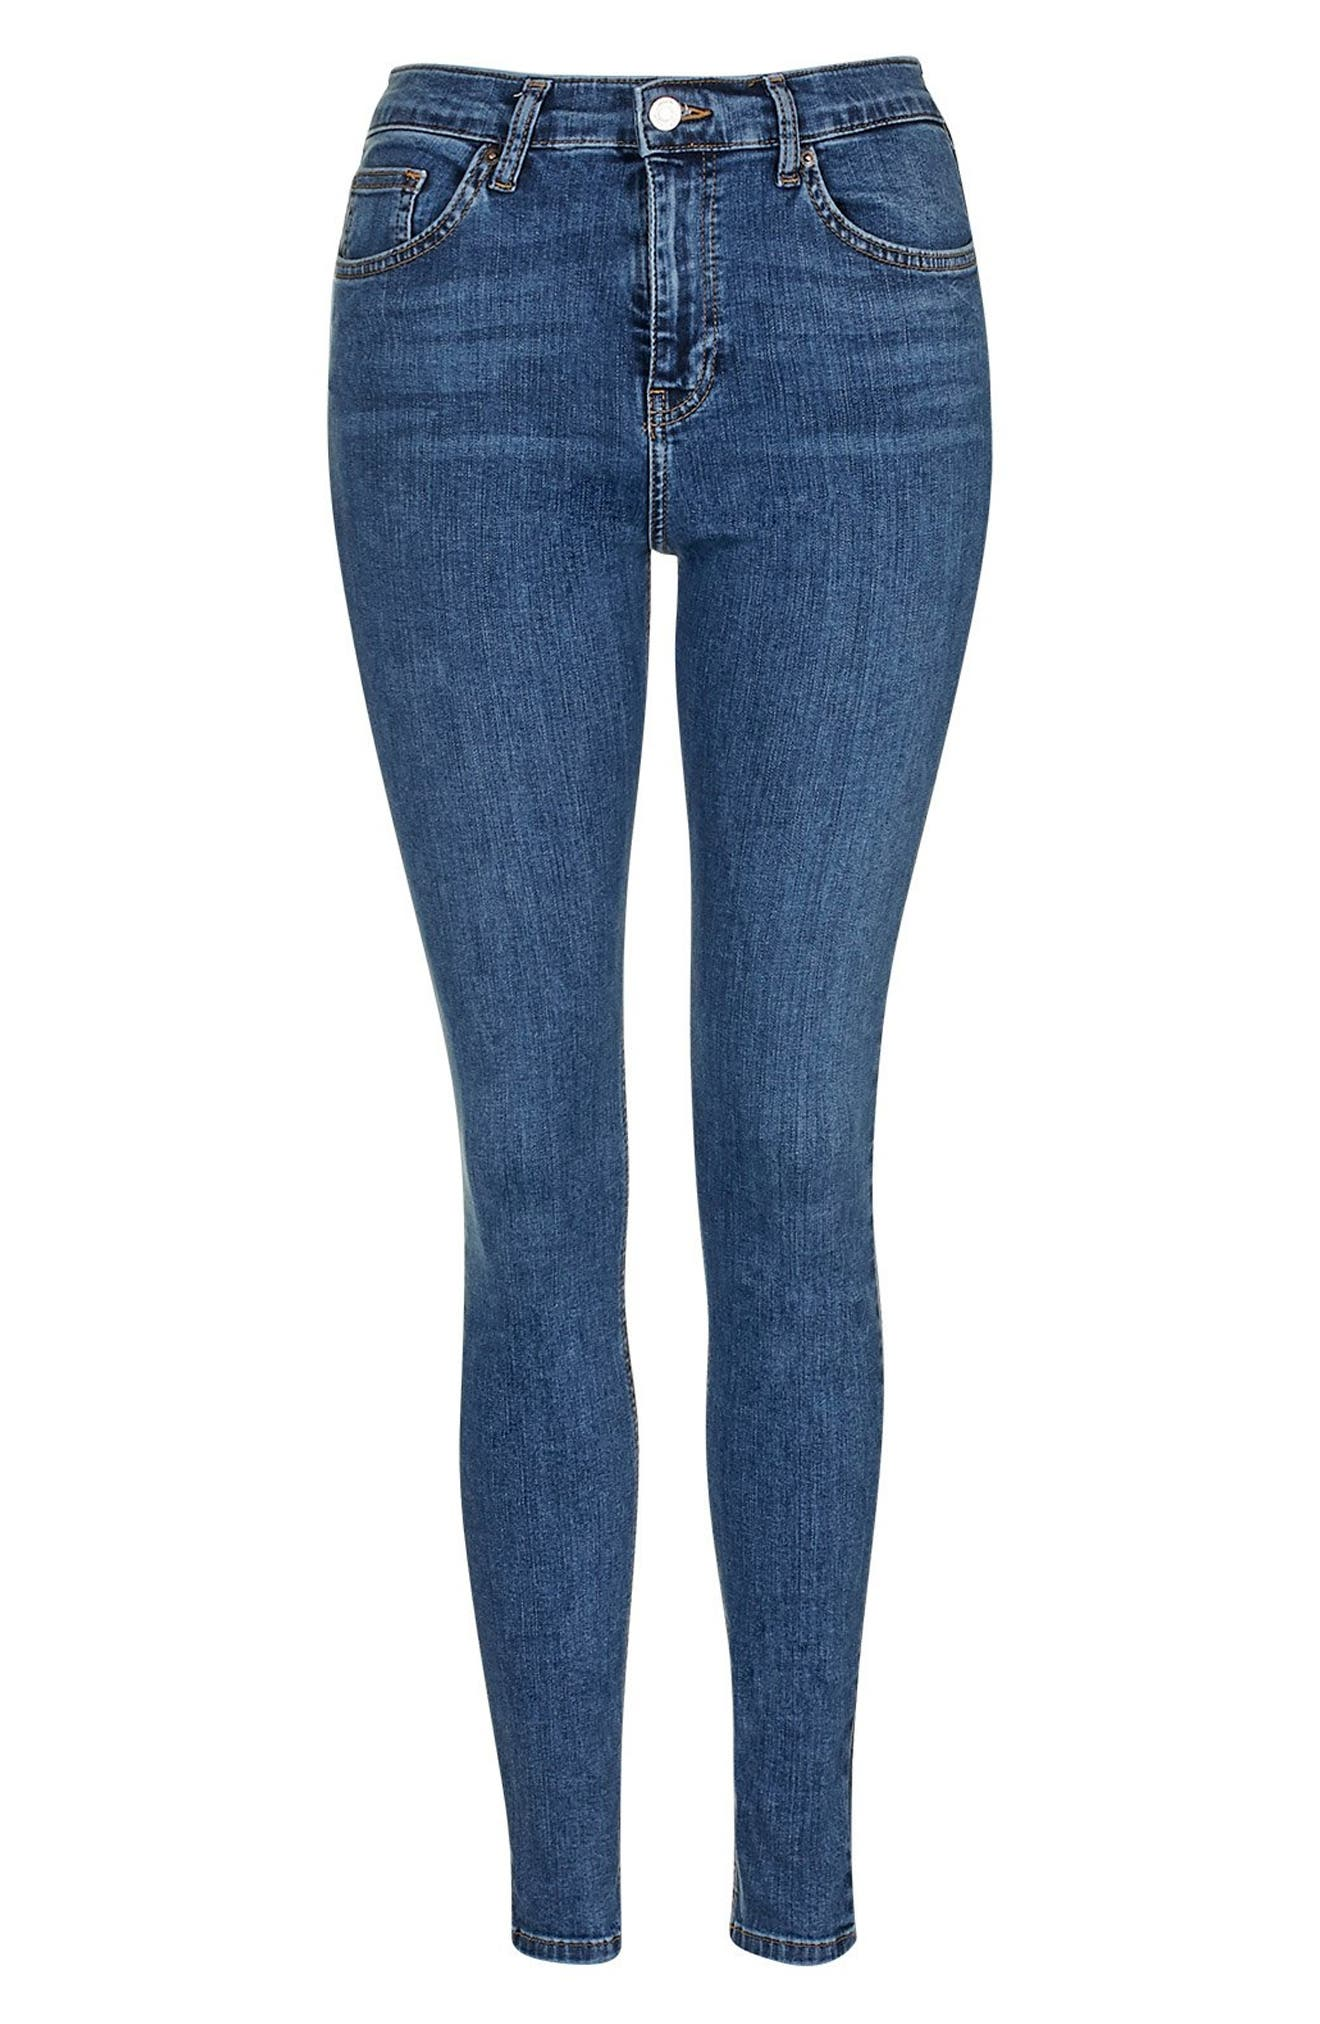 Jamie High Waist Skinny Jeans,                             Alternate thumbnail 3, color,                             MID BLUE